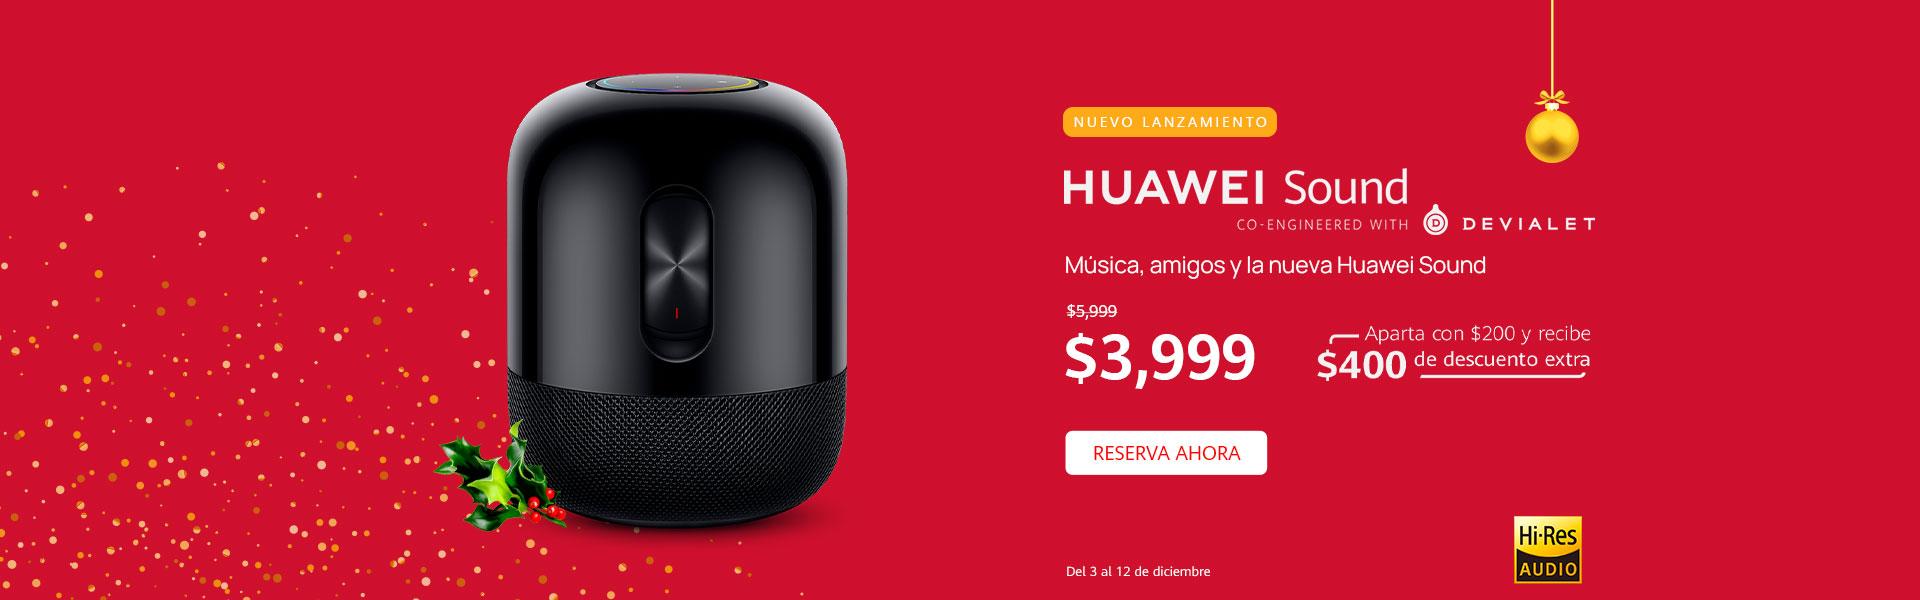 Huawei Sound KV